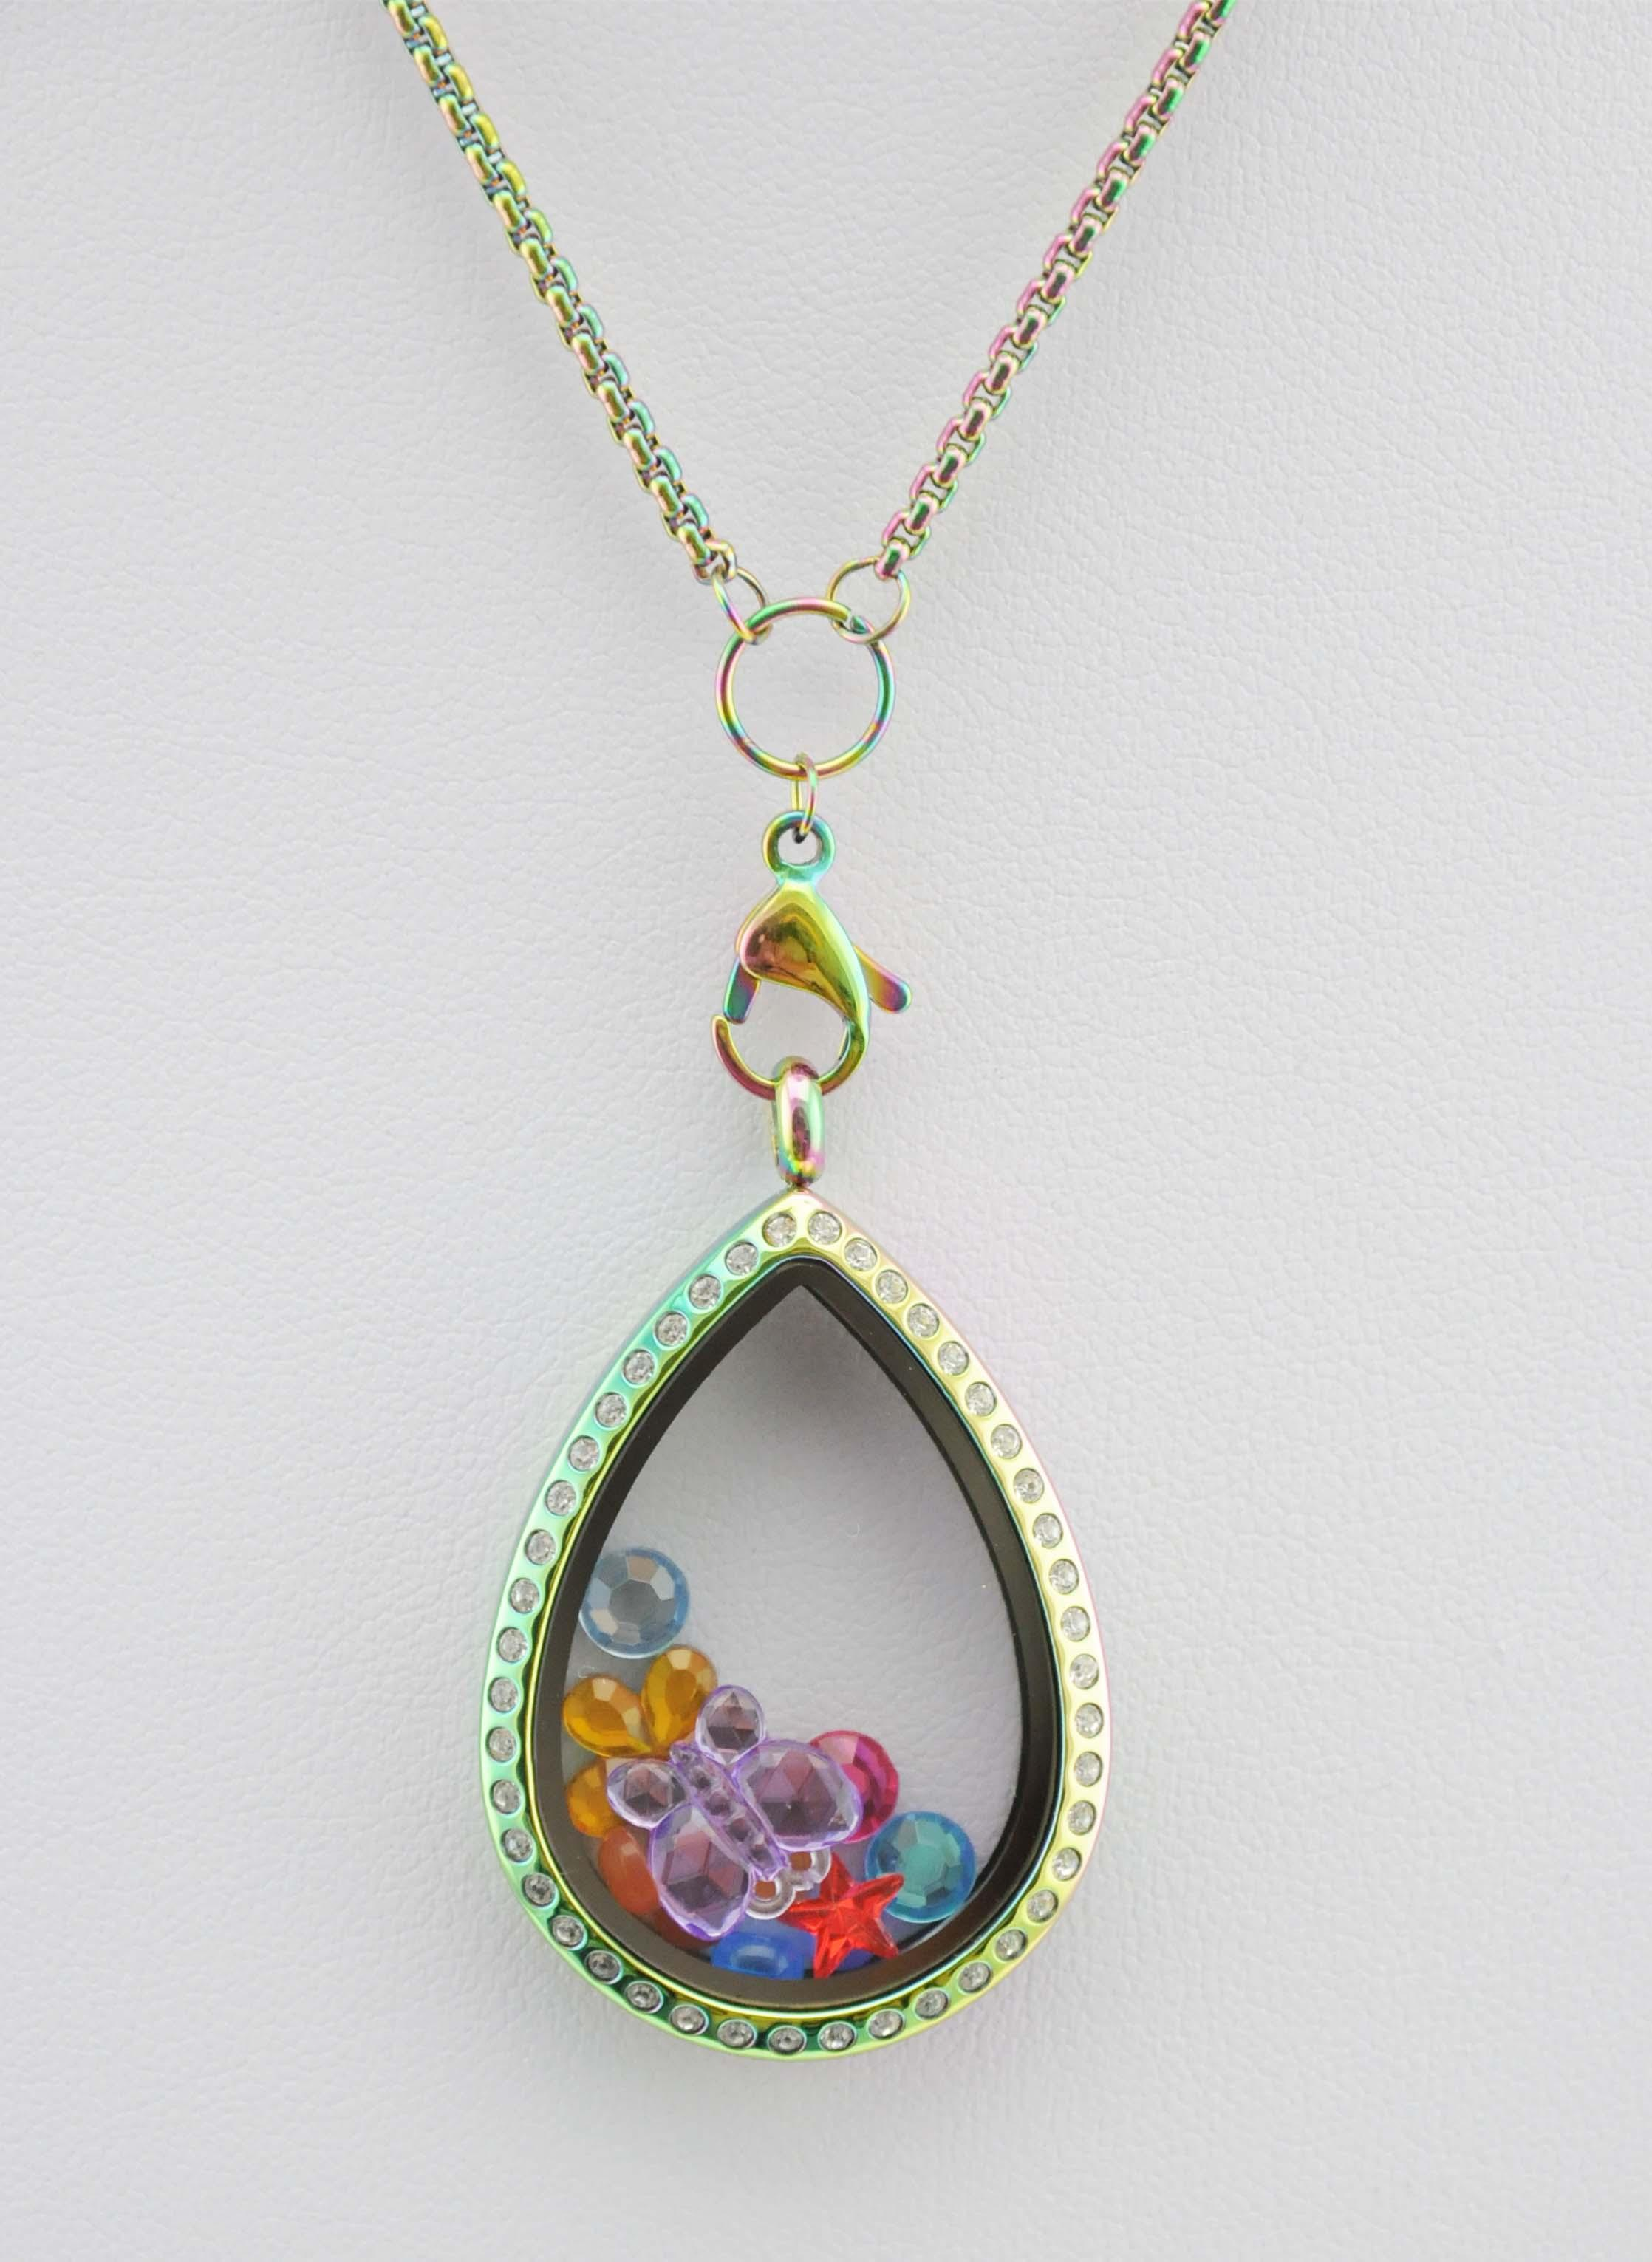 Heißer Verkauf CZ Regenbogen Teardrop Edelstahl Floating Charm Medaillon mit Crystal Magnetic Waterdrop Glass Living Medaillon